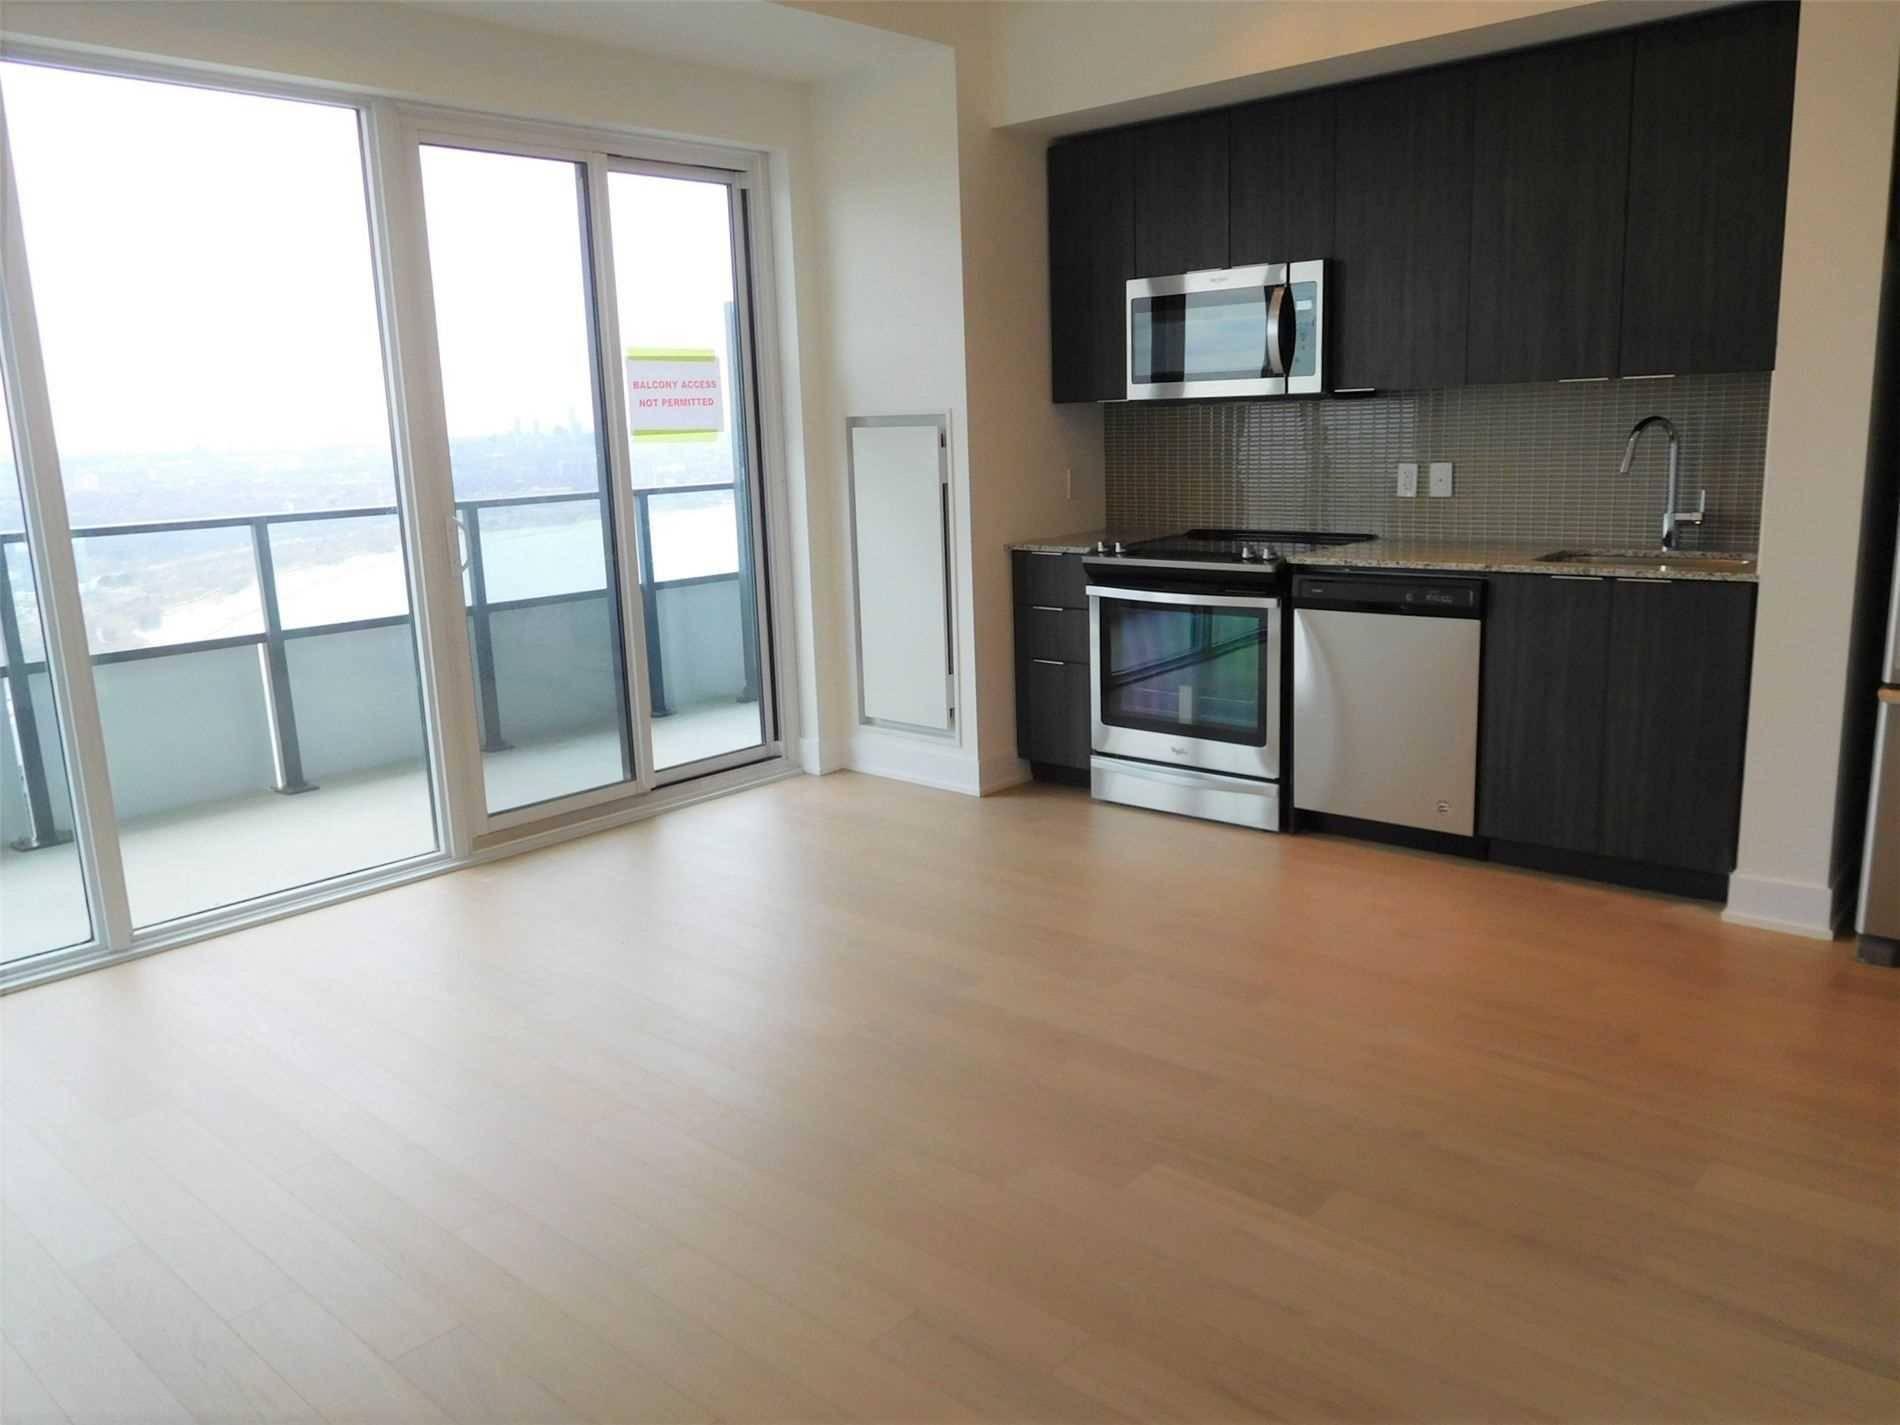 Apartment for rent at 30 Shore Breeze Dr Unit 5202 Toronto Ontario - MLS: W4667363